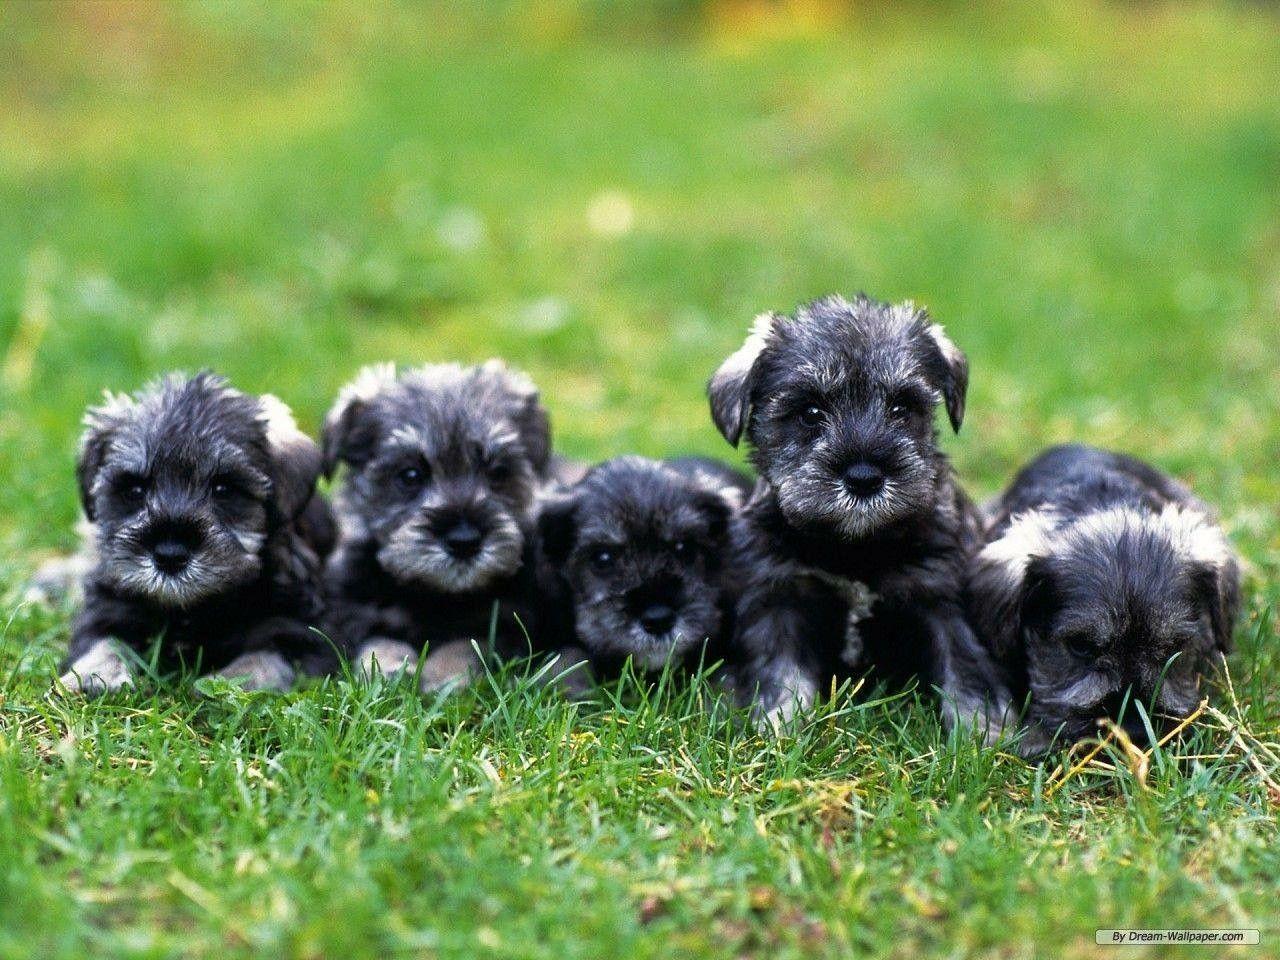 Niedliche Hunde Bilder - Niedliche Hunde Bilder